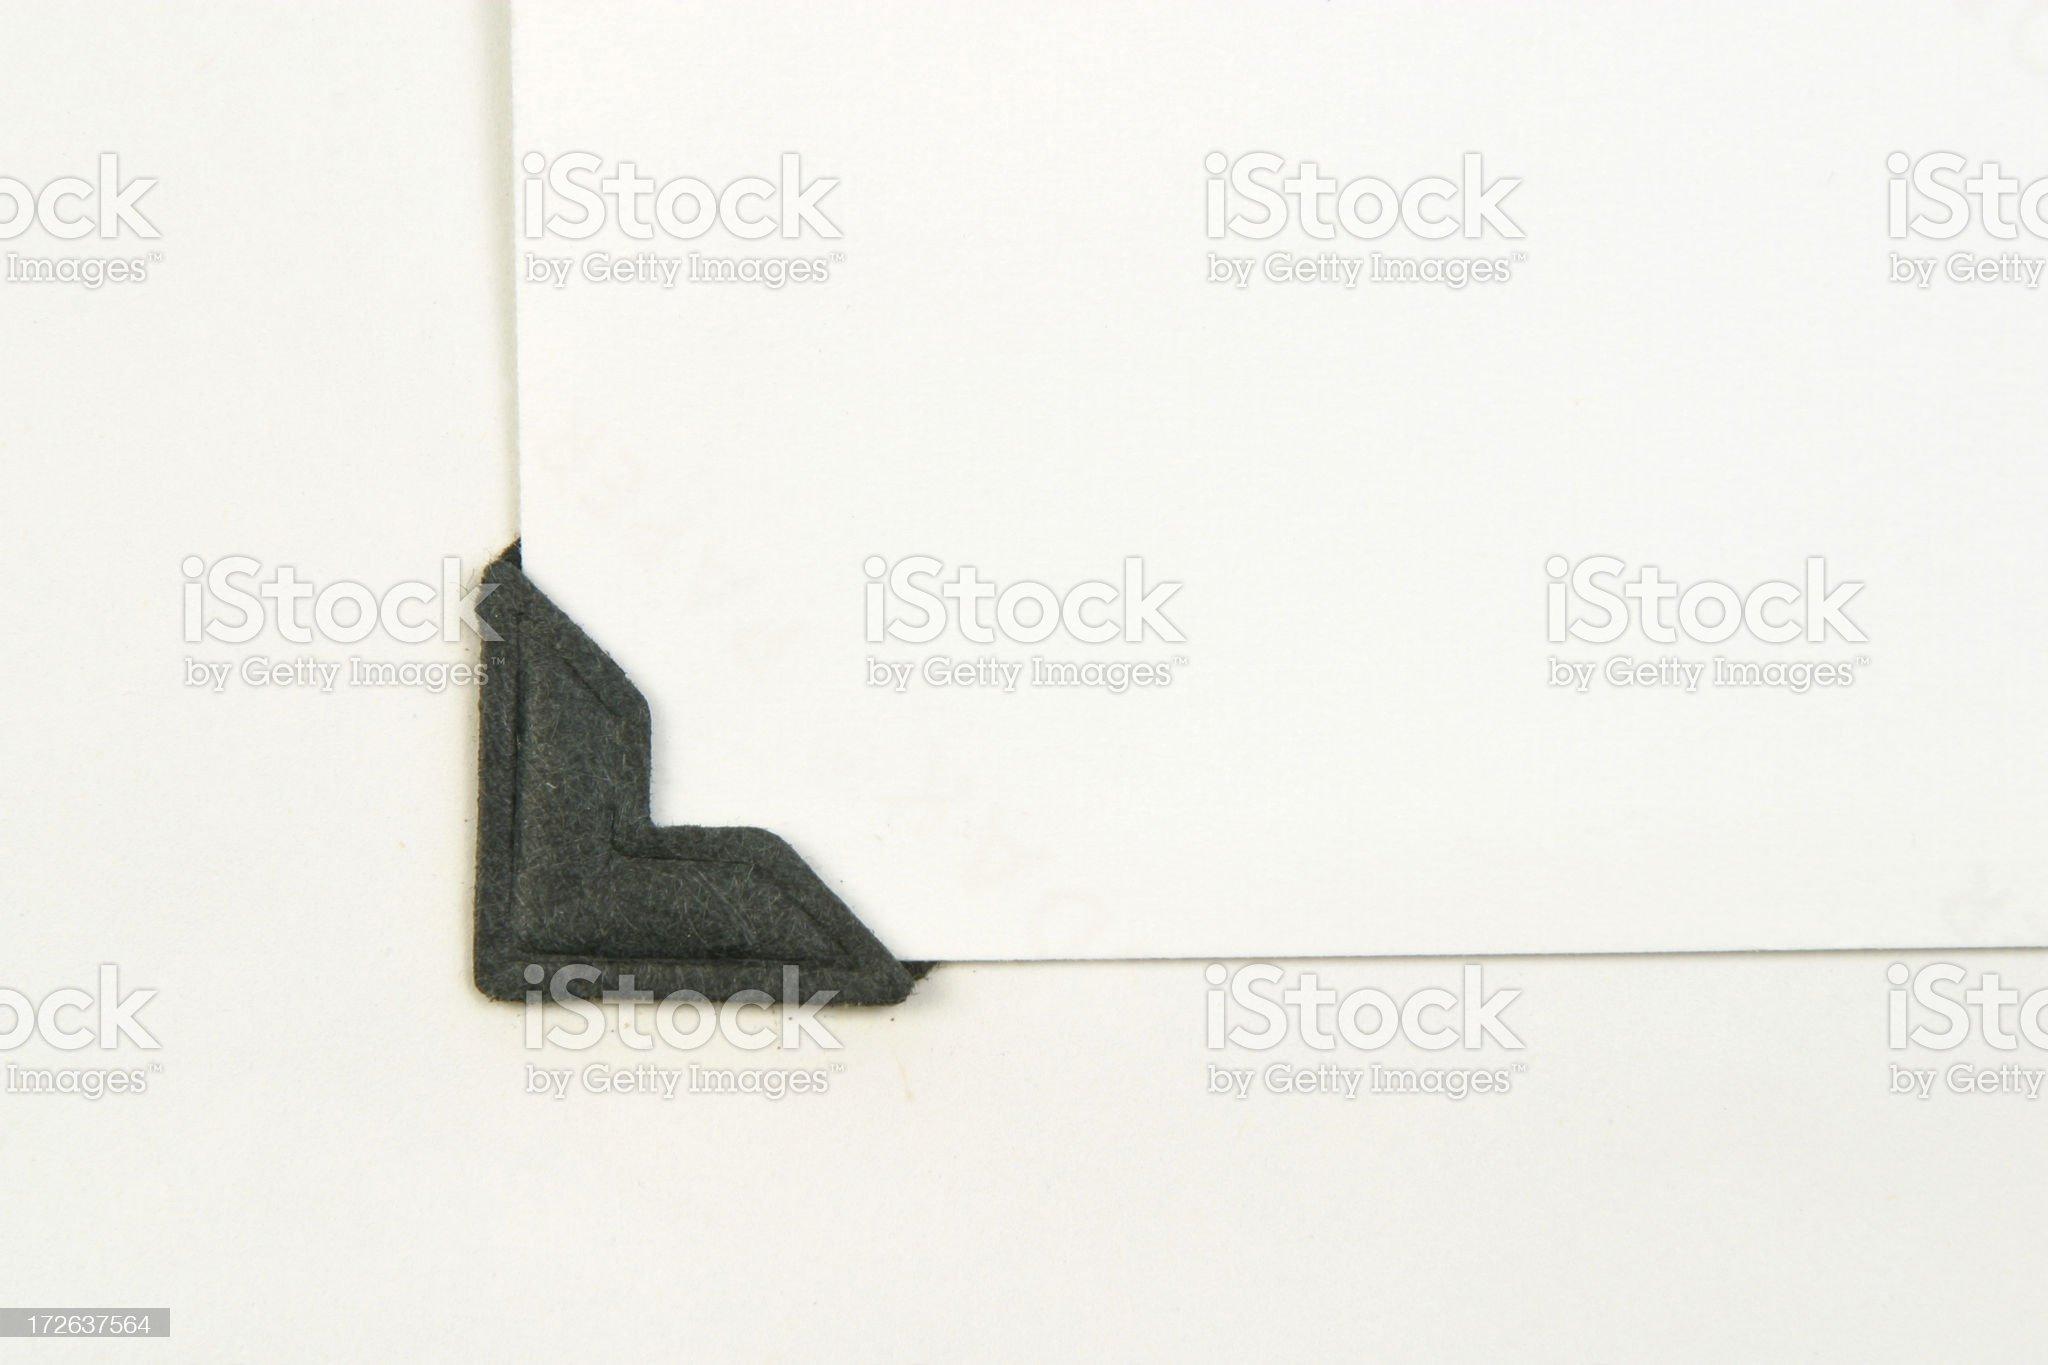 Old Black Photo Corners On Album Page royalty-free stock photo